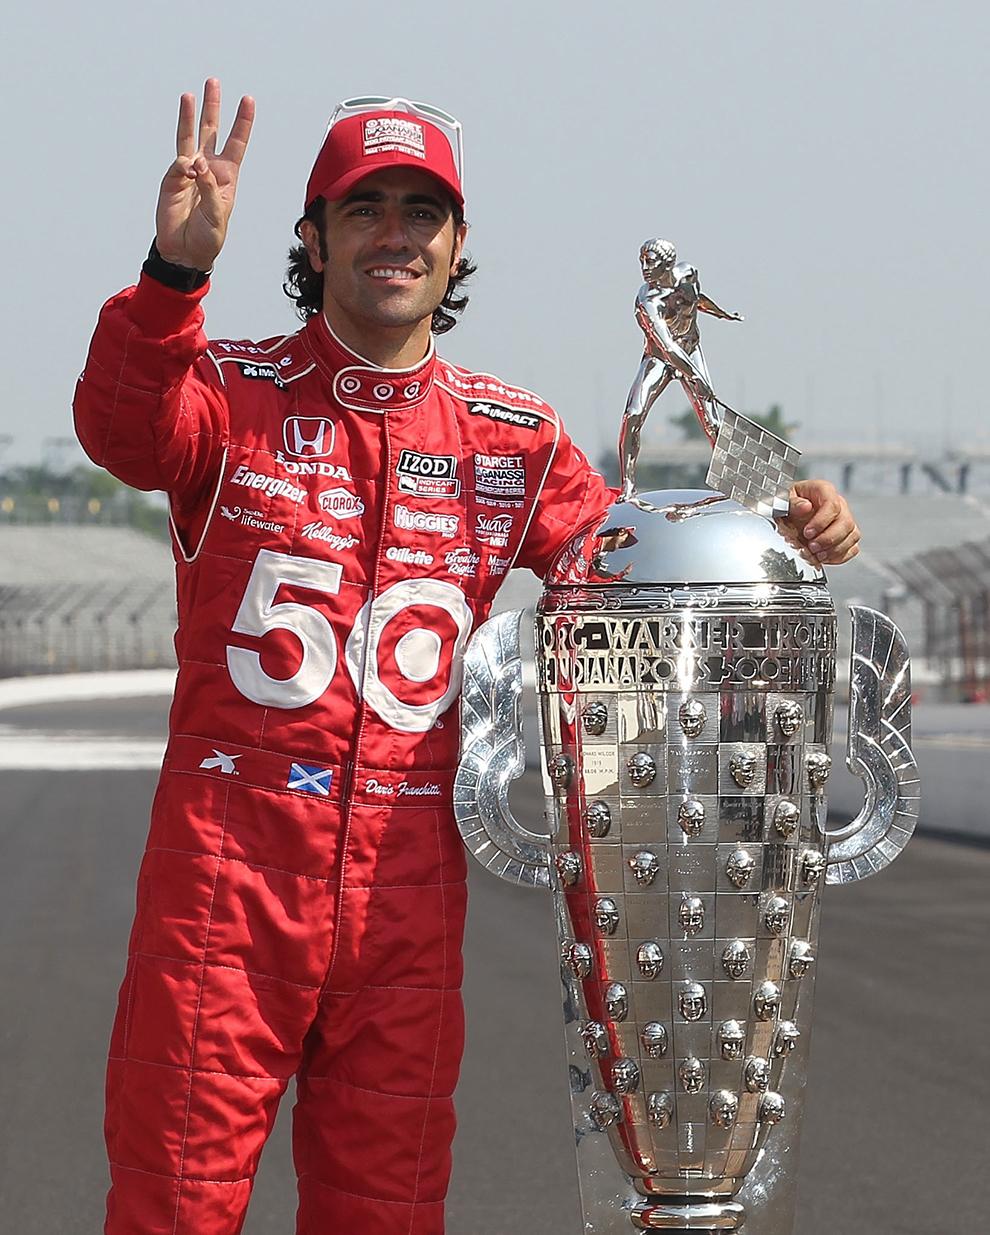 Dario Franchitti Indy 500